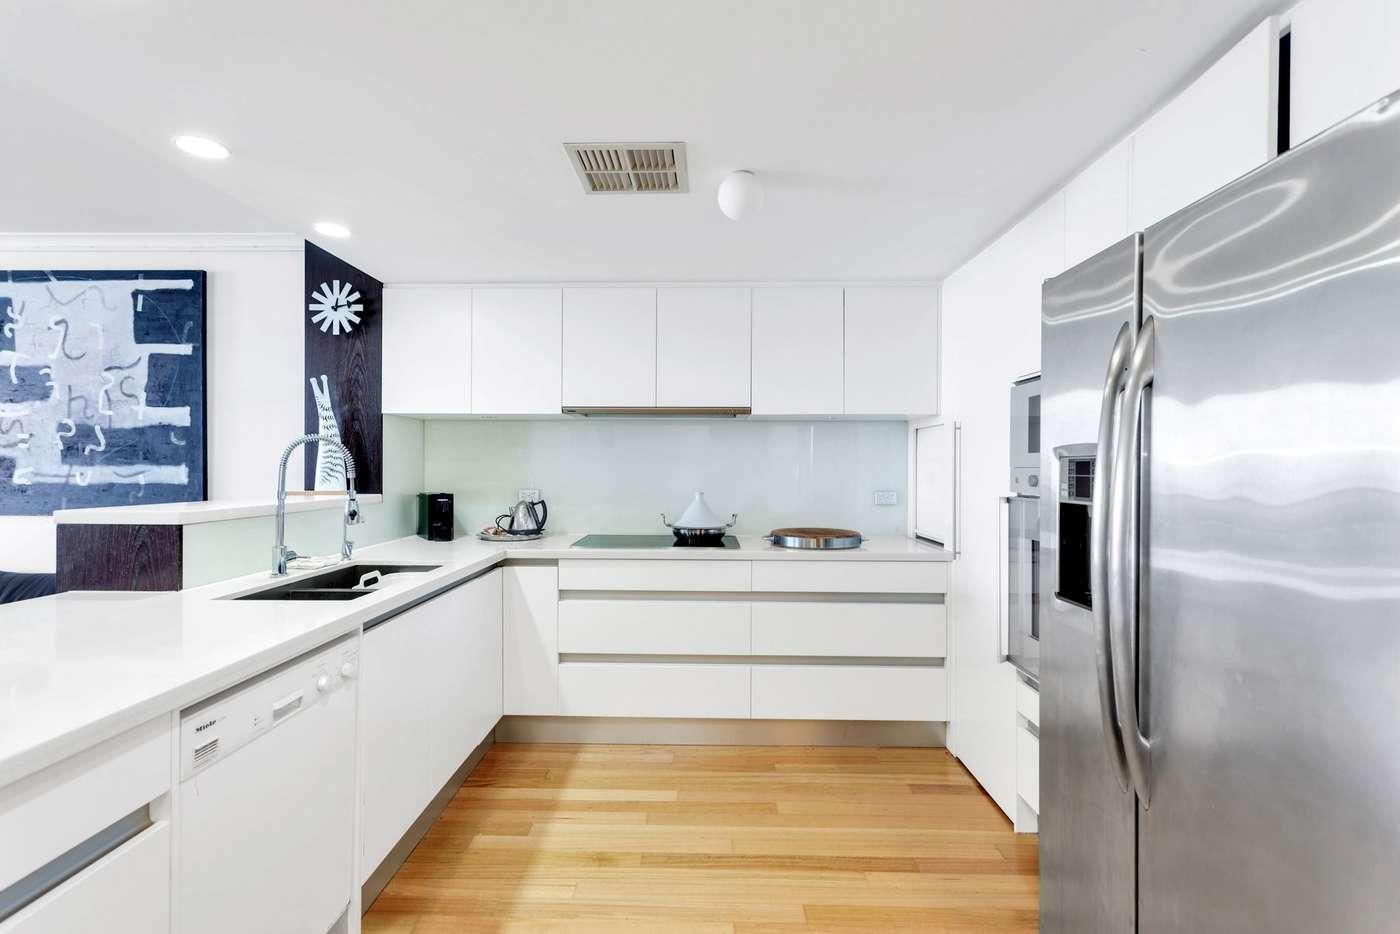 Sixth view of Homely apartment listing, 12/18 South Esplanade, Glenelg SA 5045